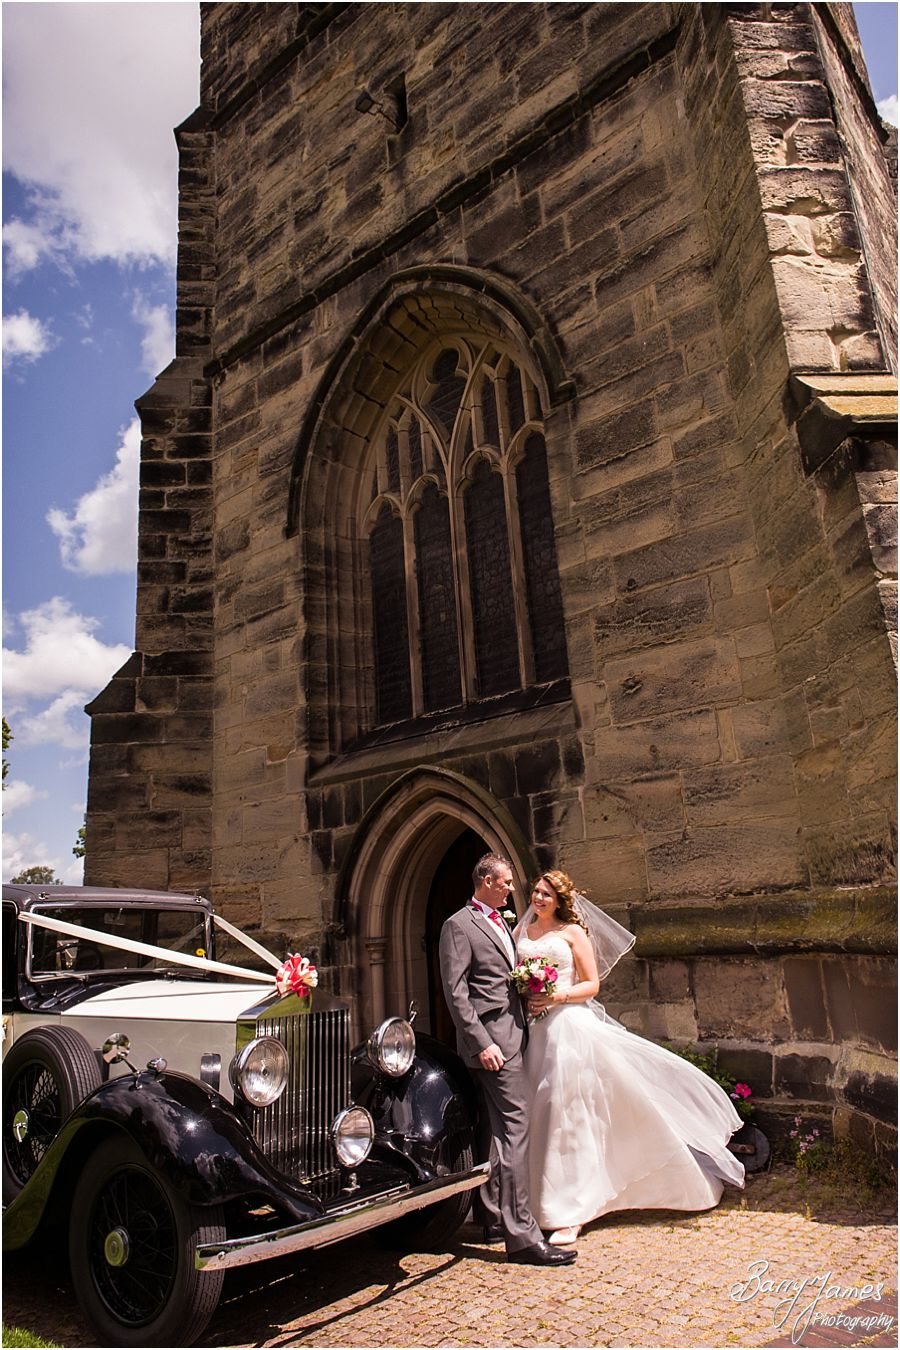 Unobtrusive natural photographs at St James Church in Barton under Needwood by Barton Under Needwood Wedding Photographer Barry James